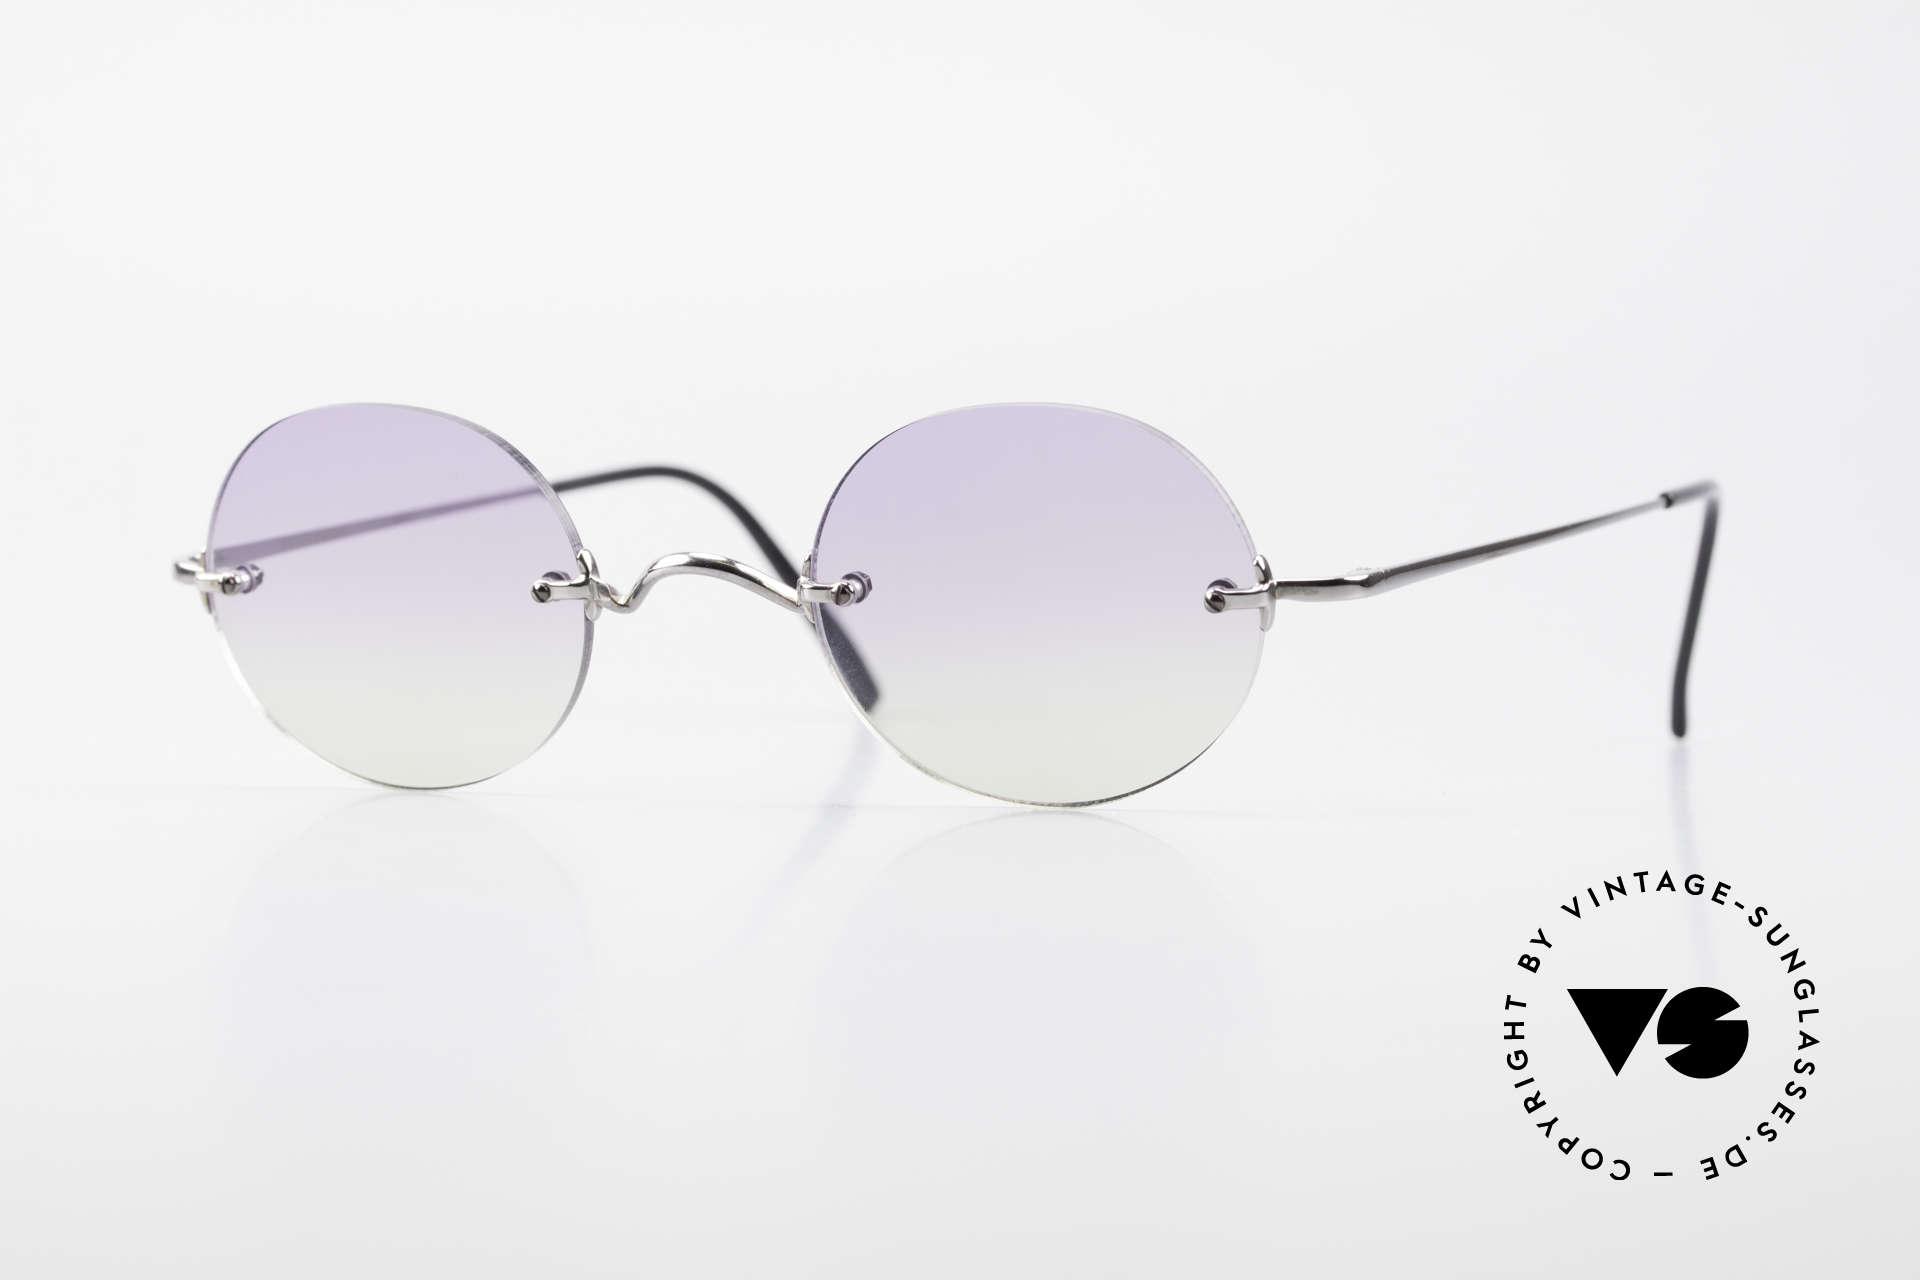 Freudenhaus Flemming Round Rimless Sunglasses, rimless designer shades by FREUDENHAUS, Munich, Made for Men and Women